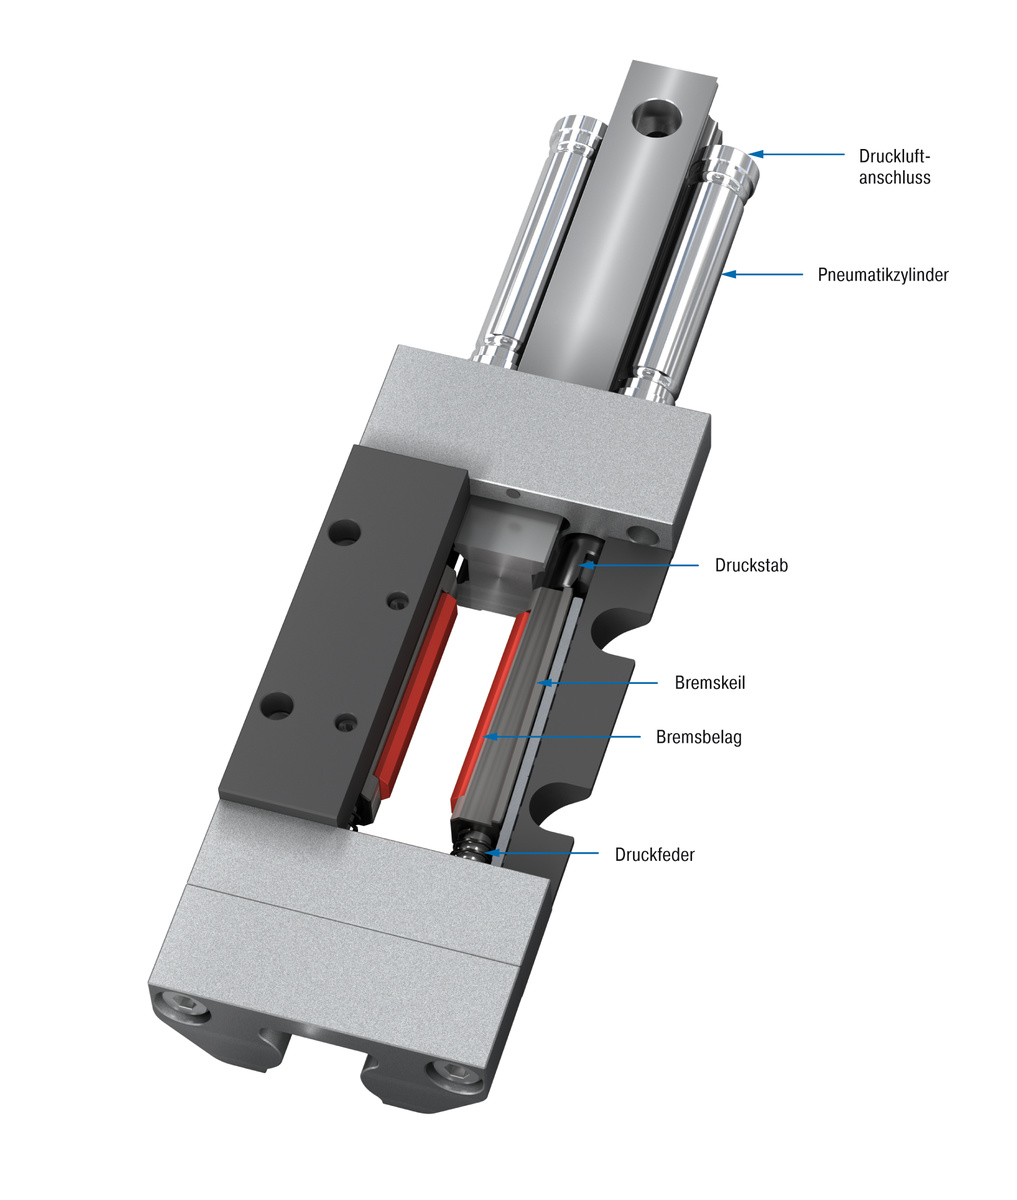 ACE Stoßdämpfer GmbH - Bild - LOCKED LZ-P